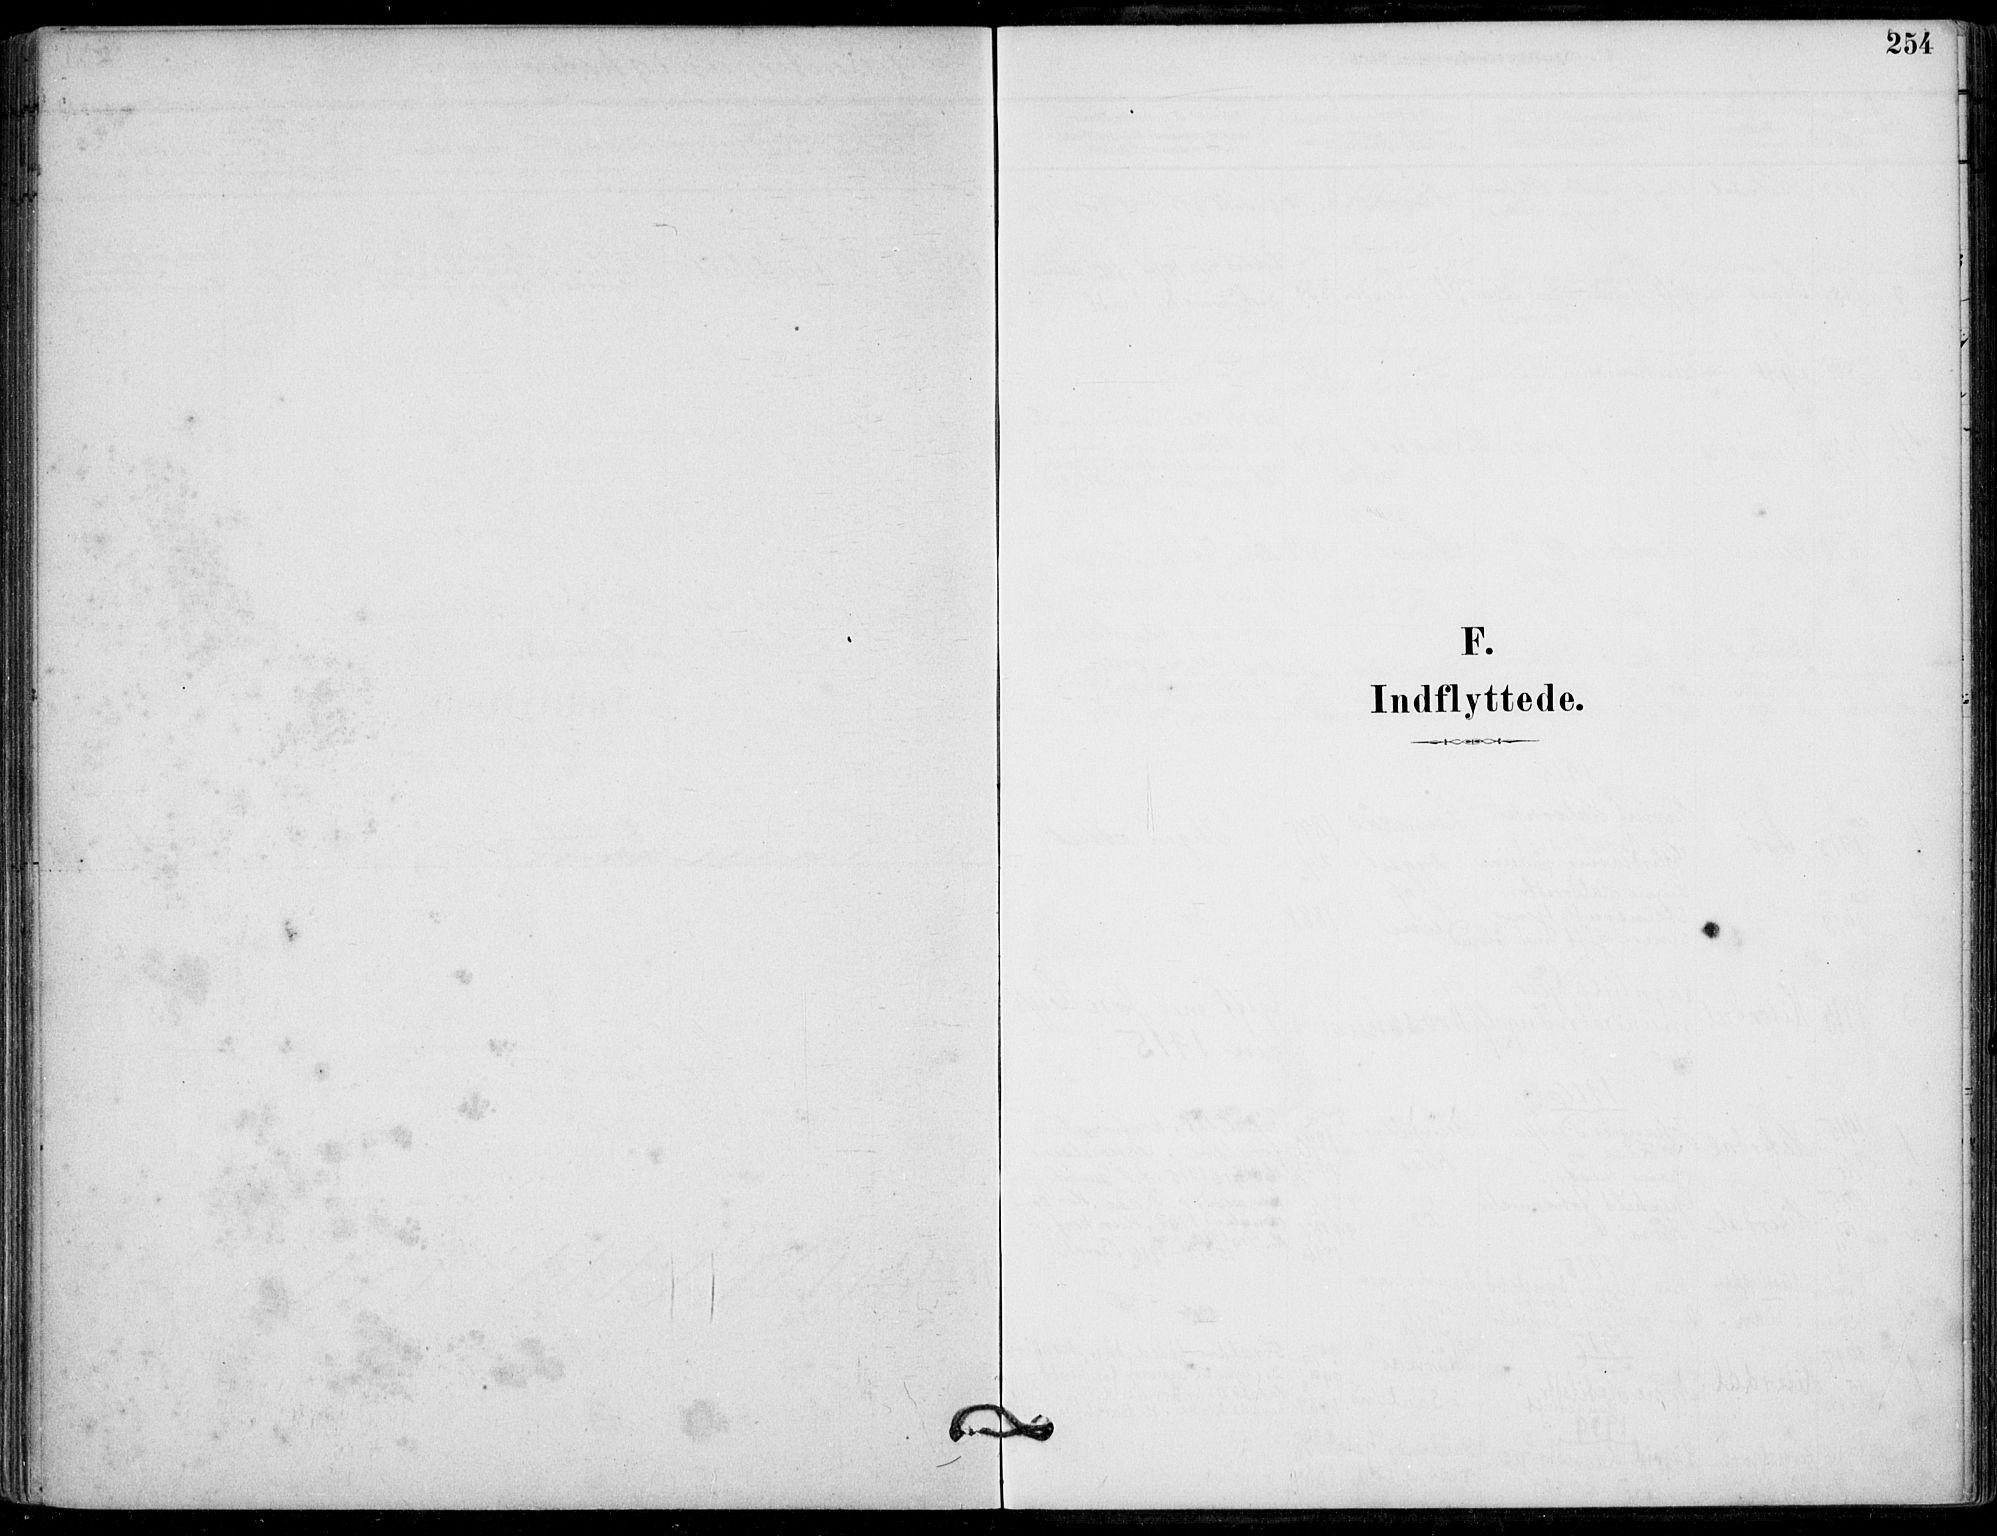 SAKO, Hjartdal kirkebøker, F/Fb/L0002: Ministerialbok nr. II 2, 1880-1932, s. 254